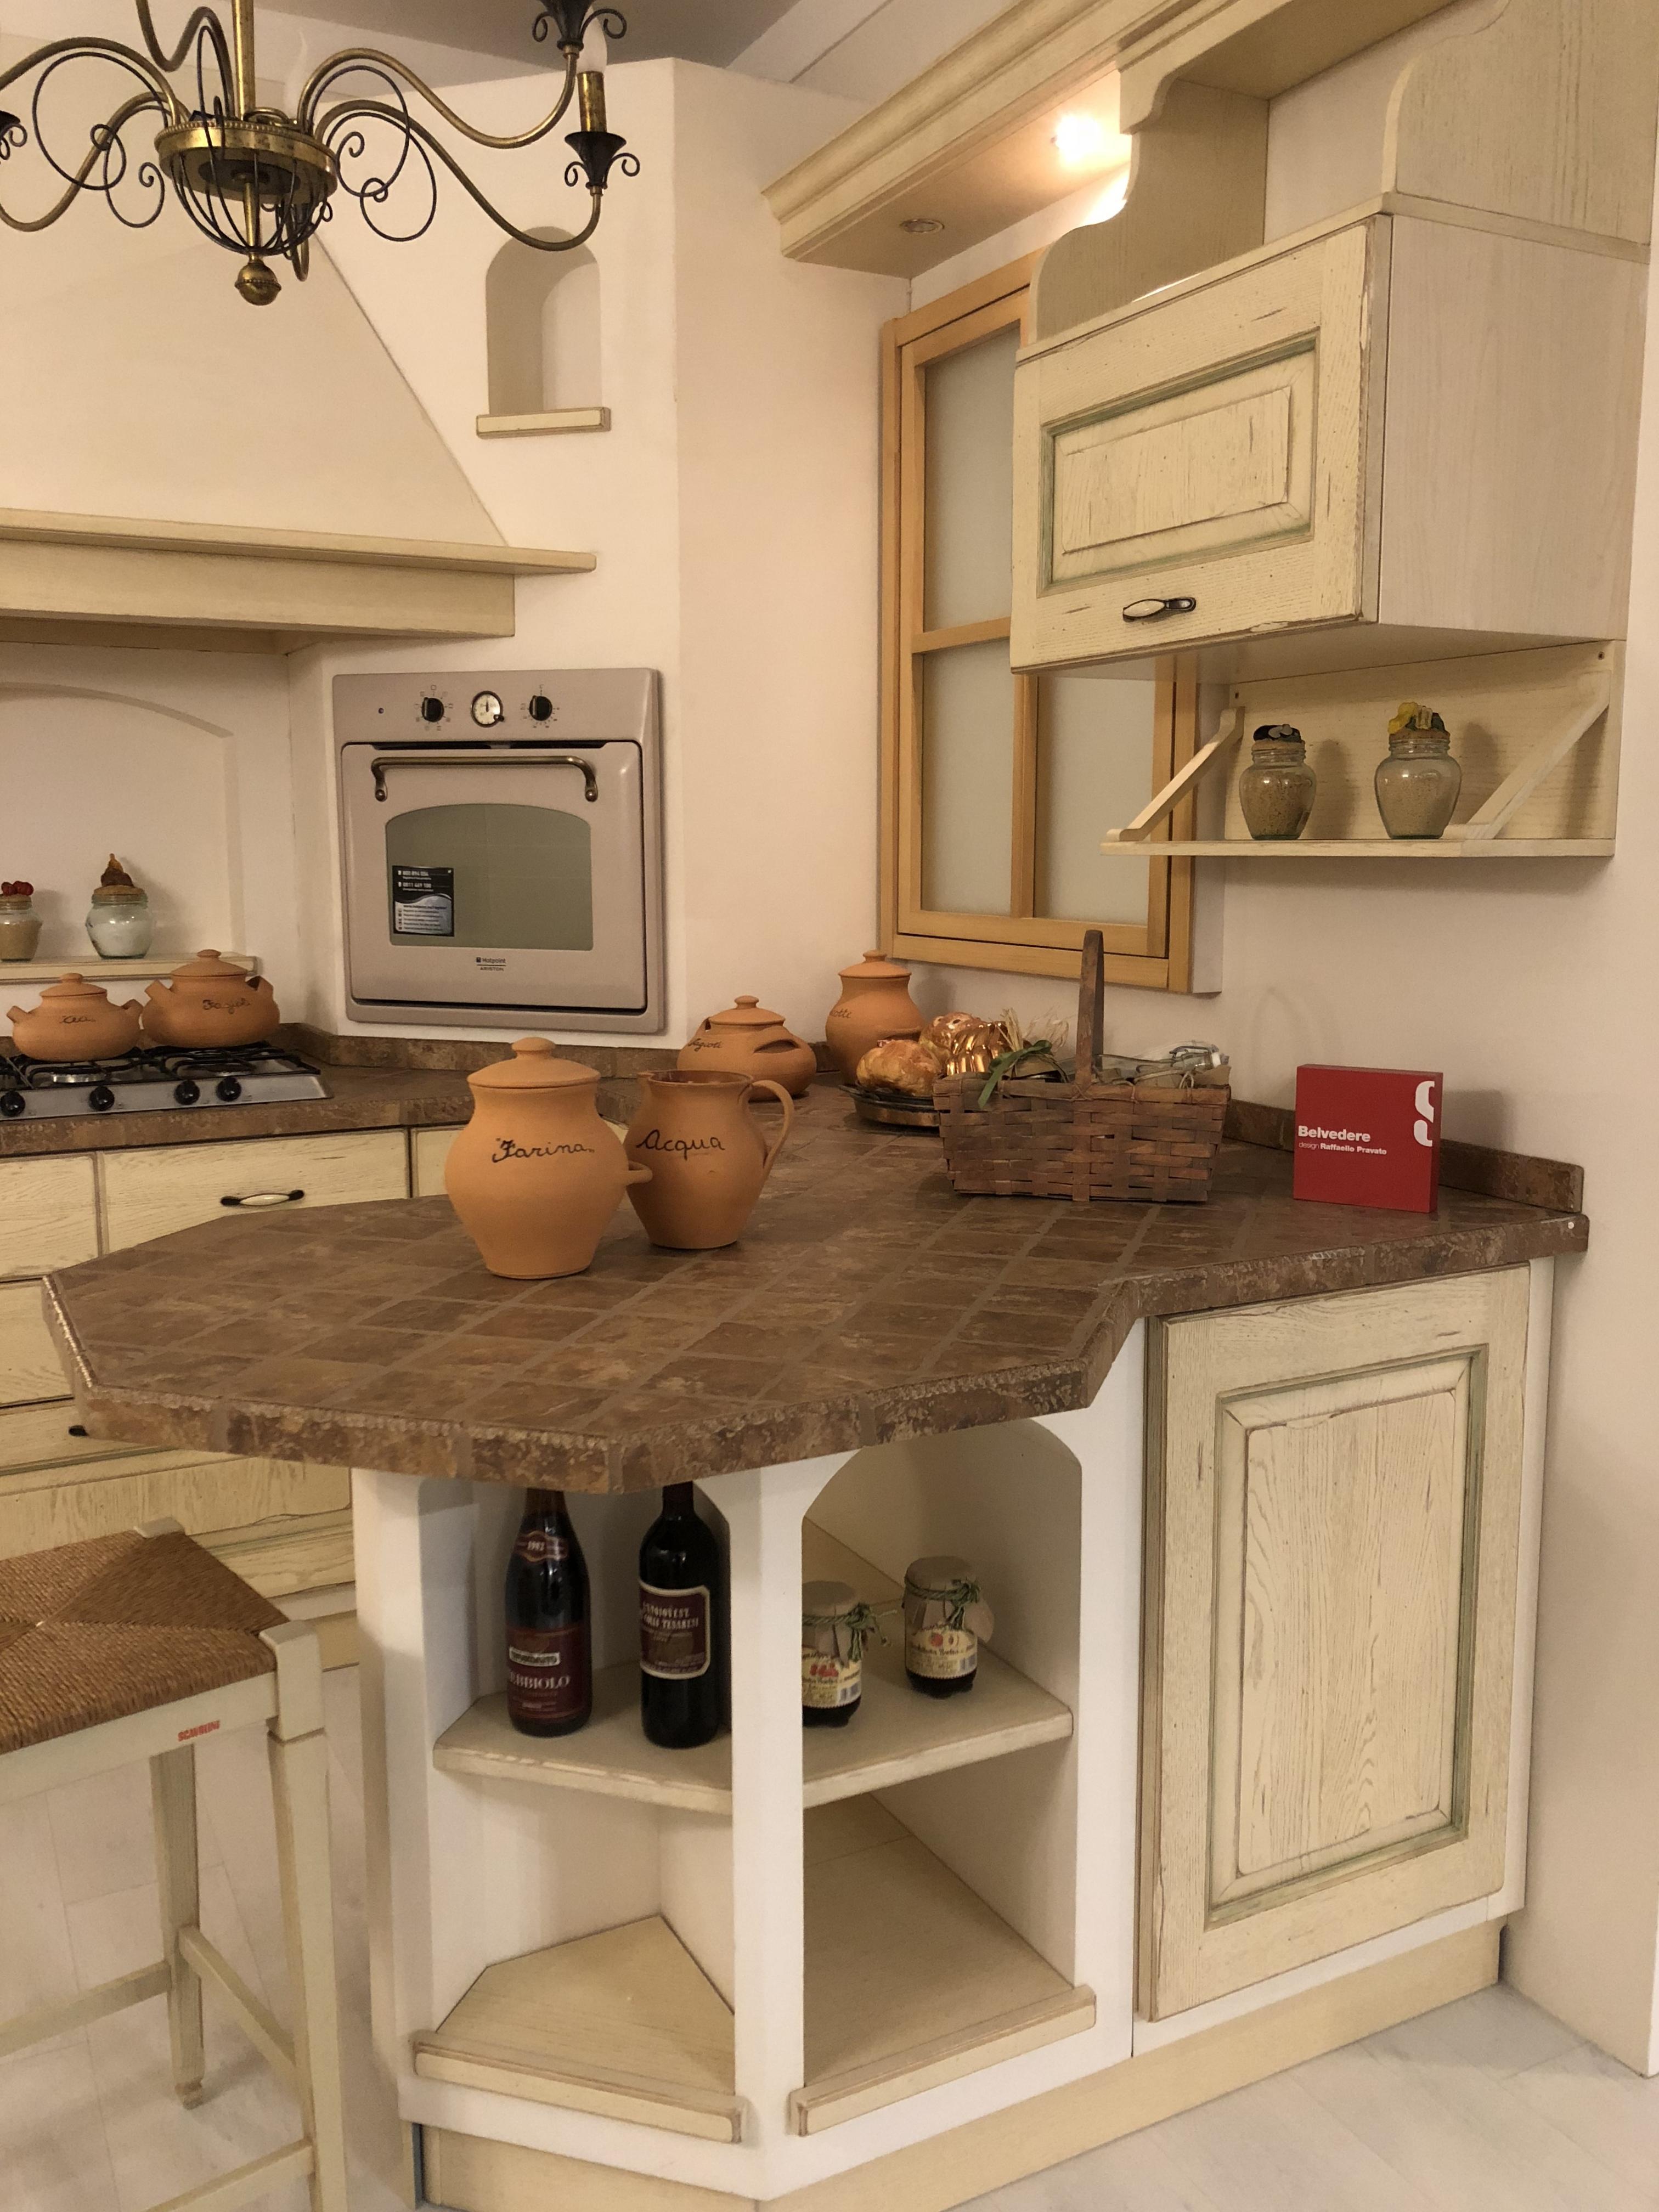 BELVEDERE Cucina Scavoliniin offerta per arredamento a Modena ...